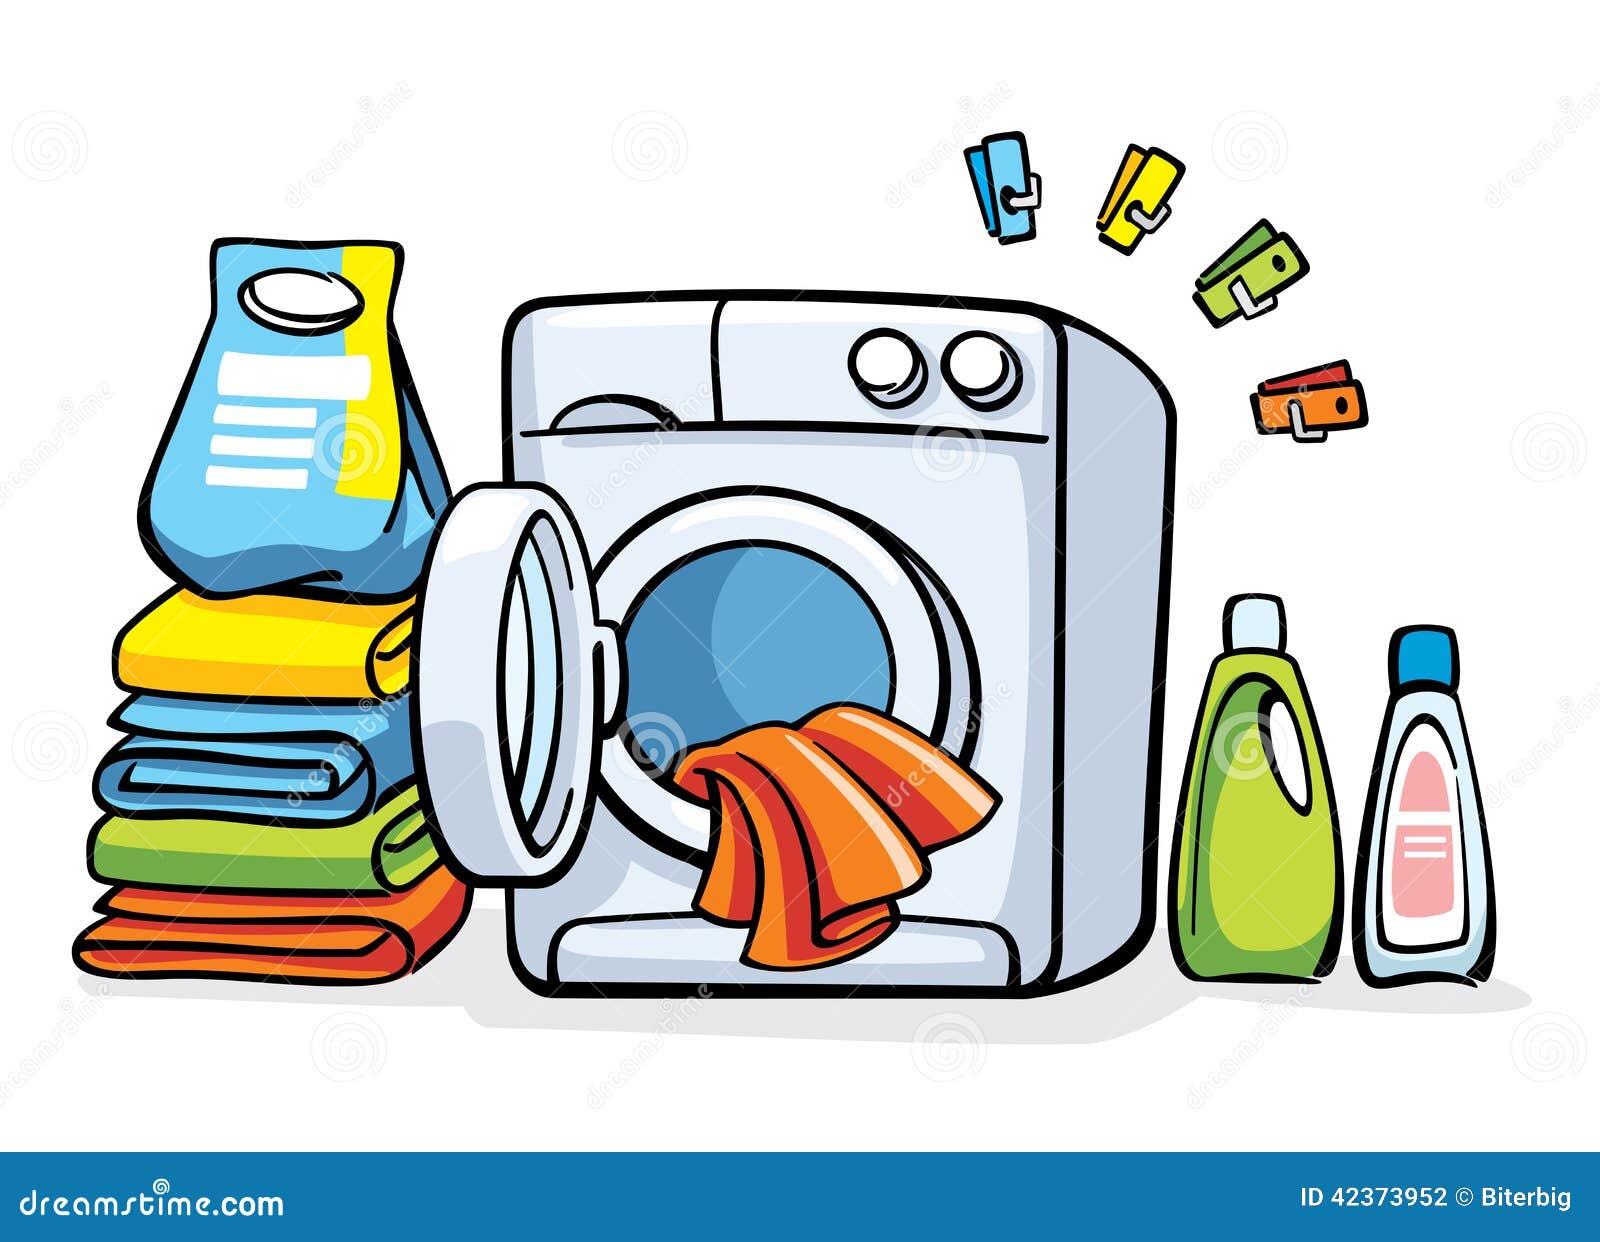 wash clothes machine